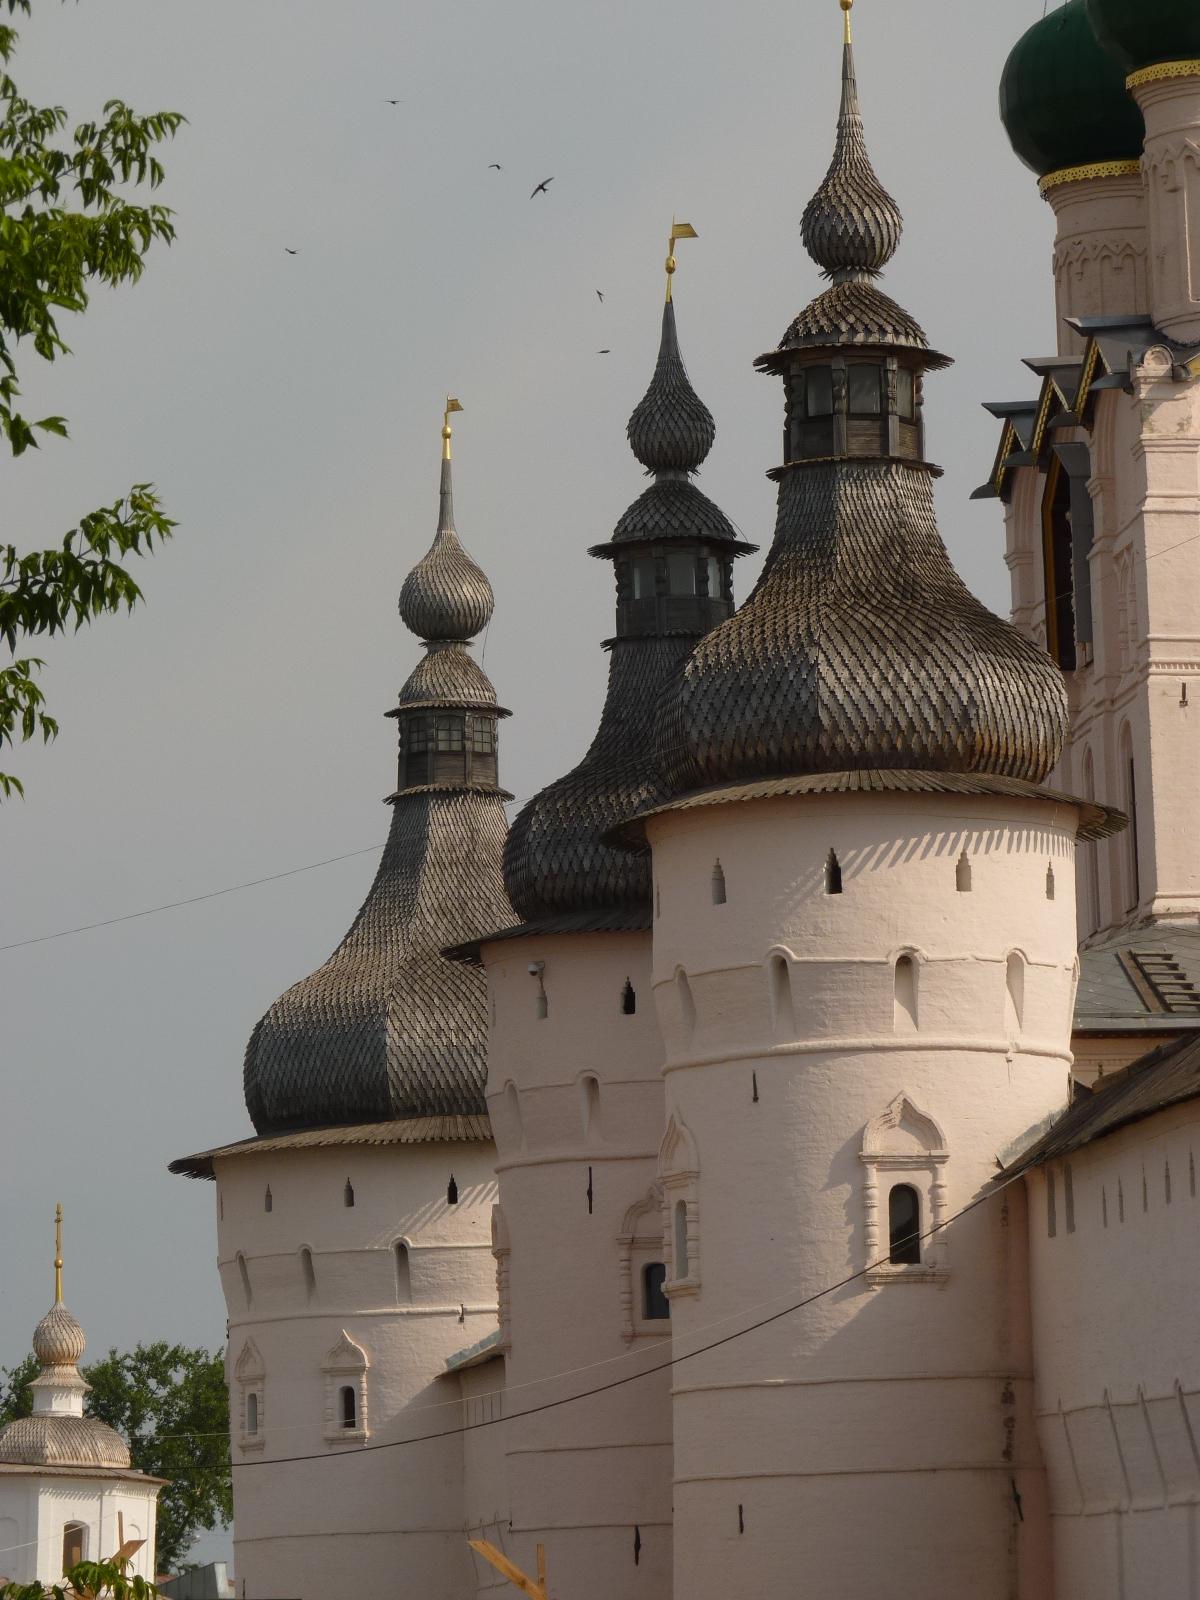 le Kremlin de Rostov